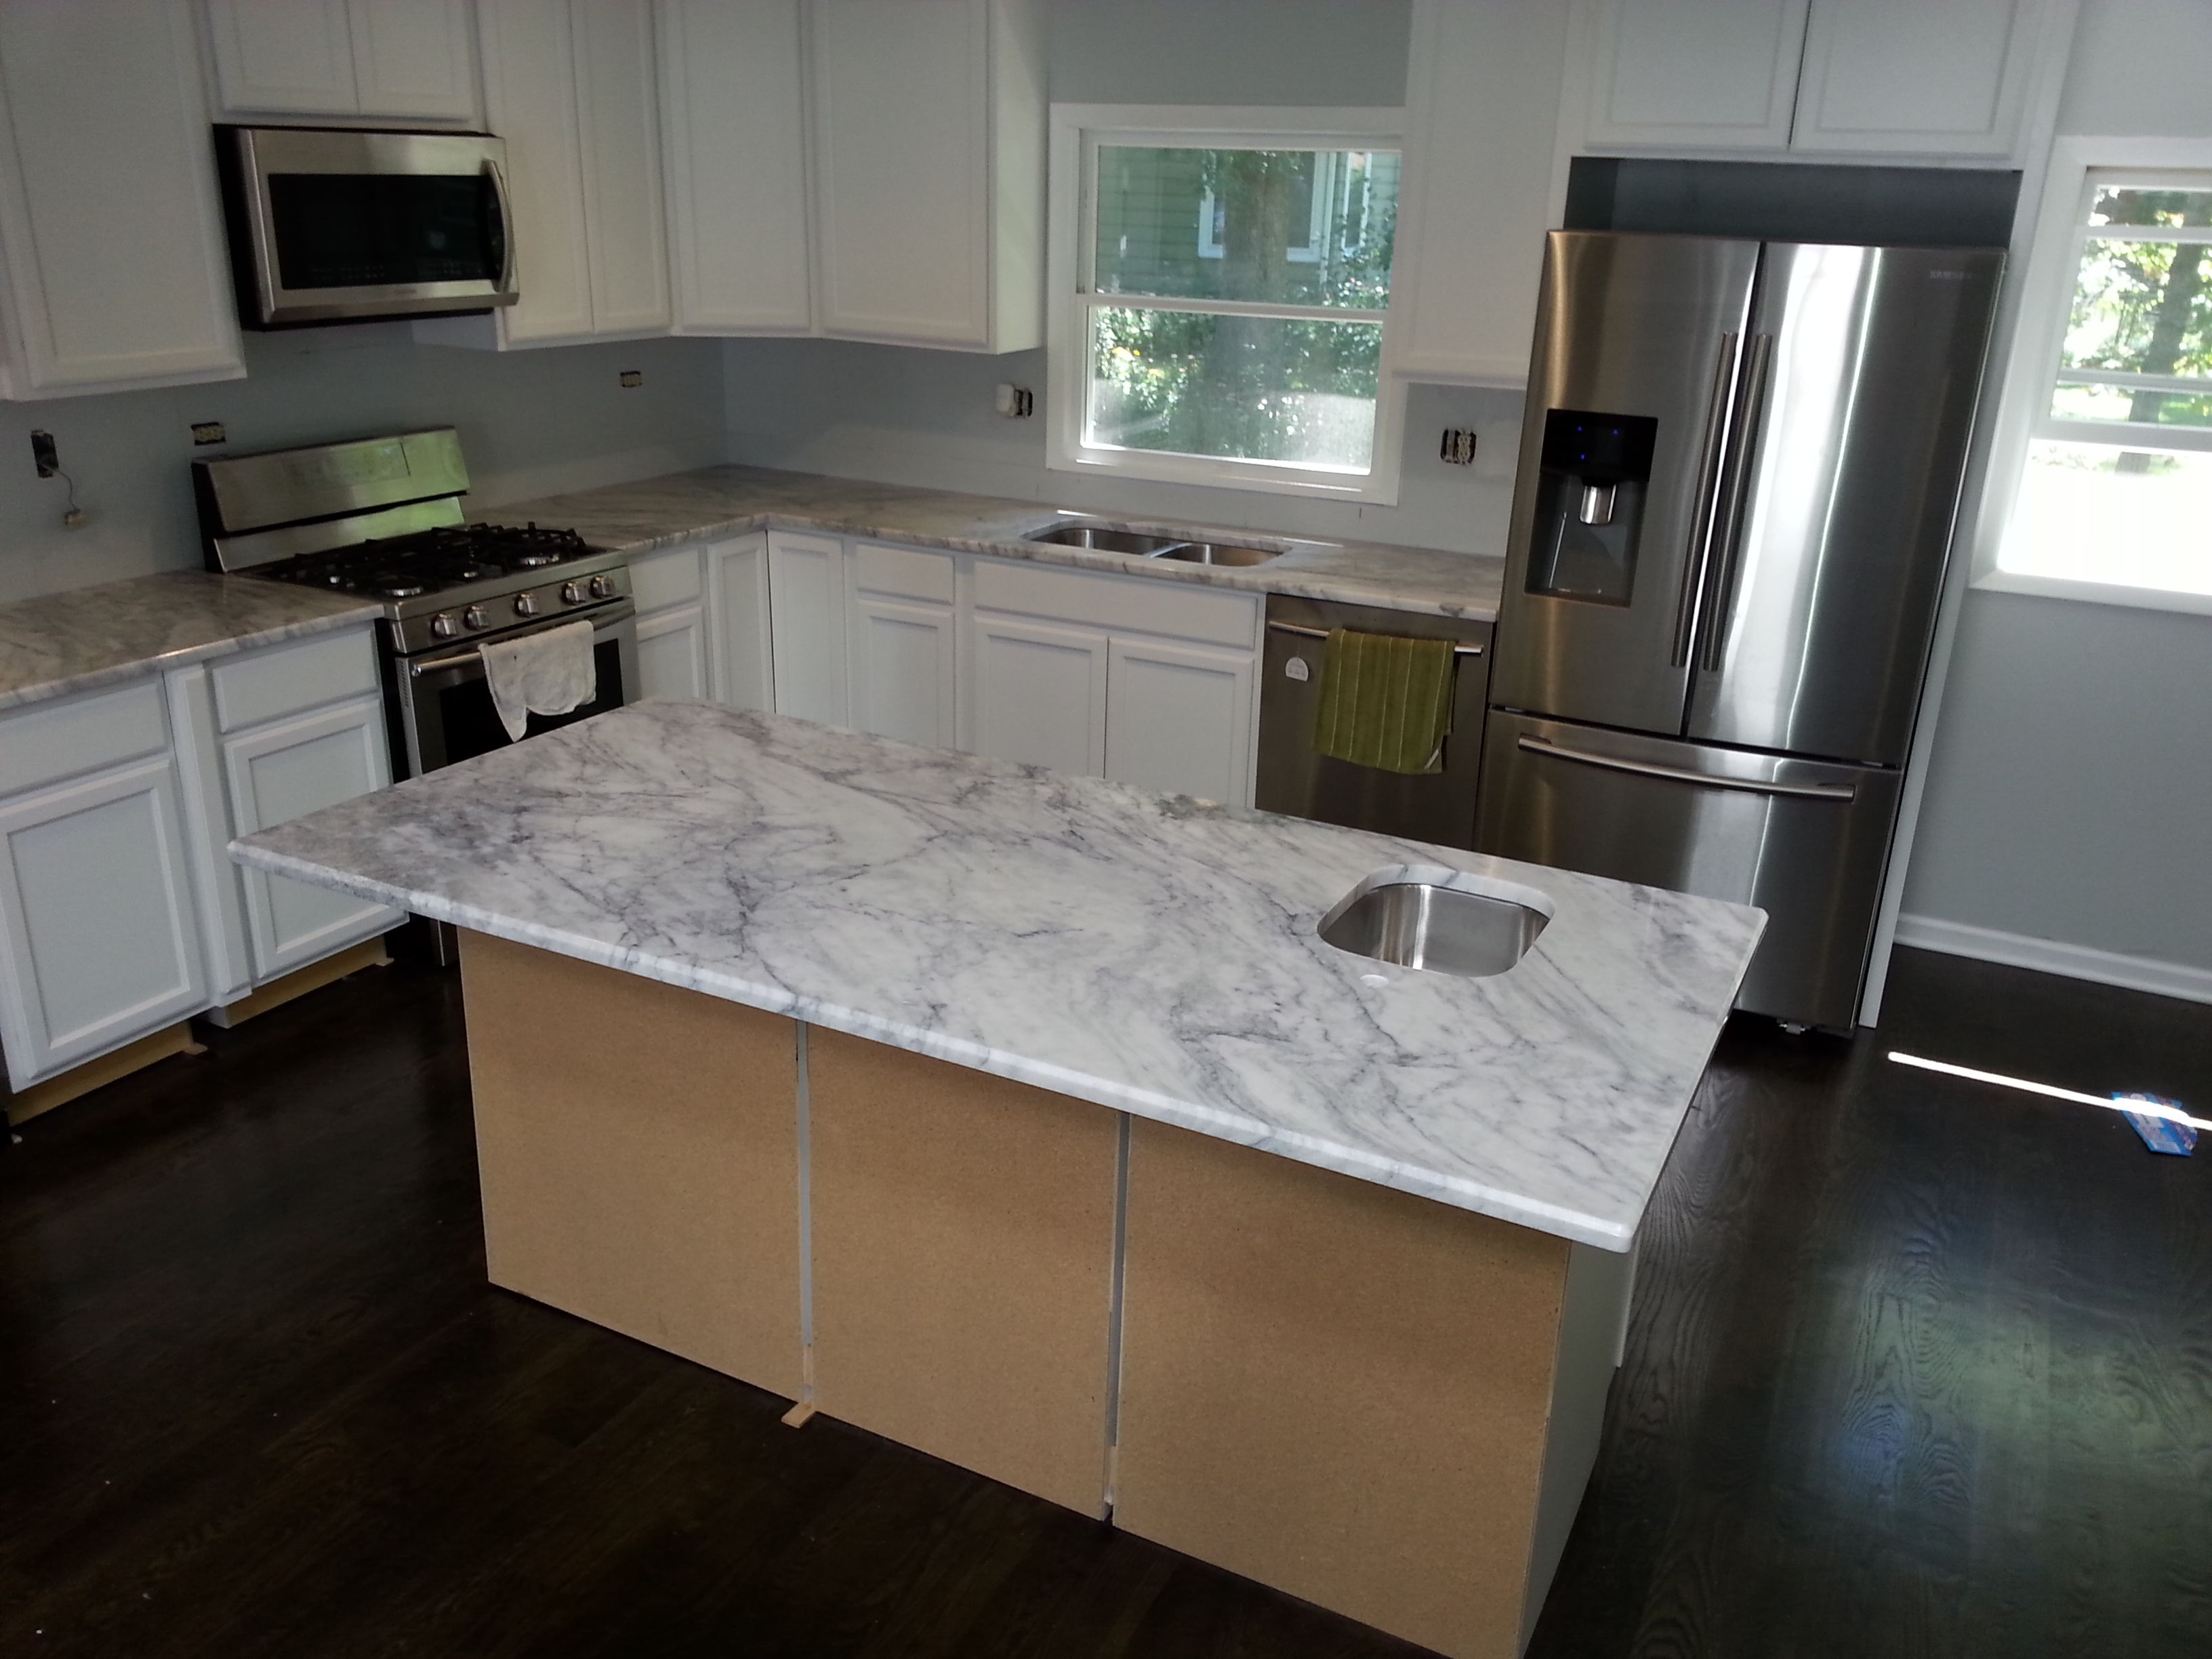 Merveilleux Art Granite Countertops Inc. 1020 Lunt Ave . Unit F Schaumburg IL , 60193  Tel